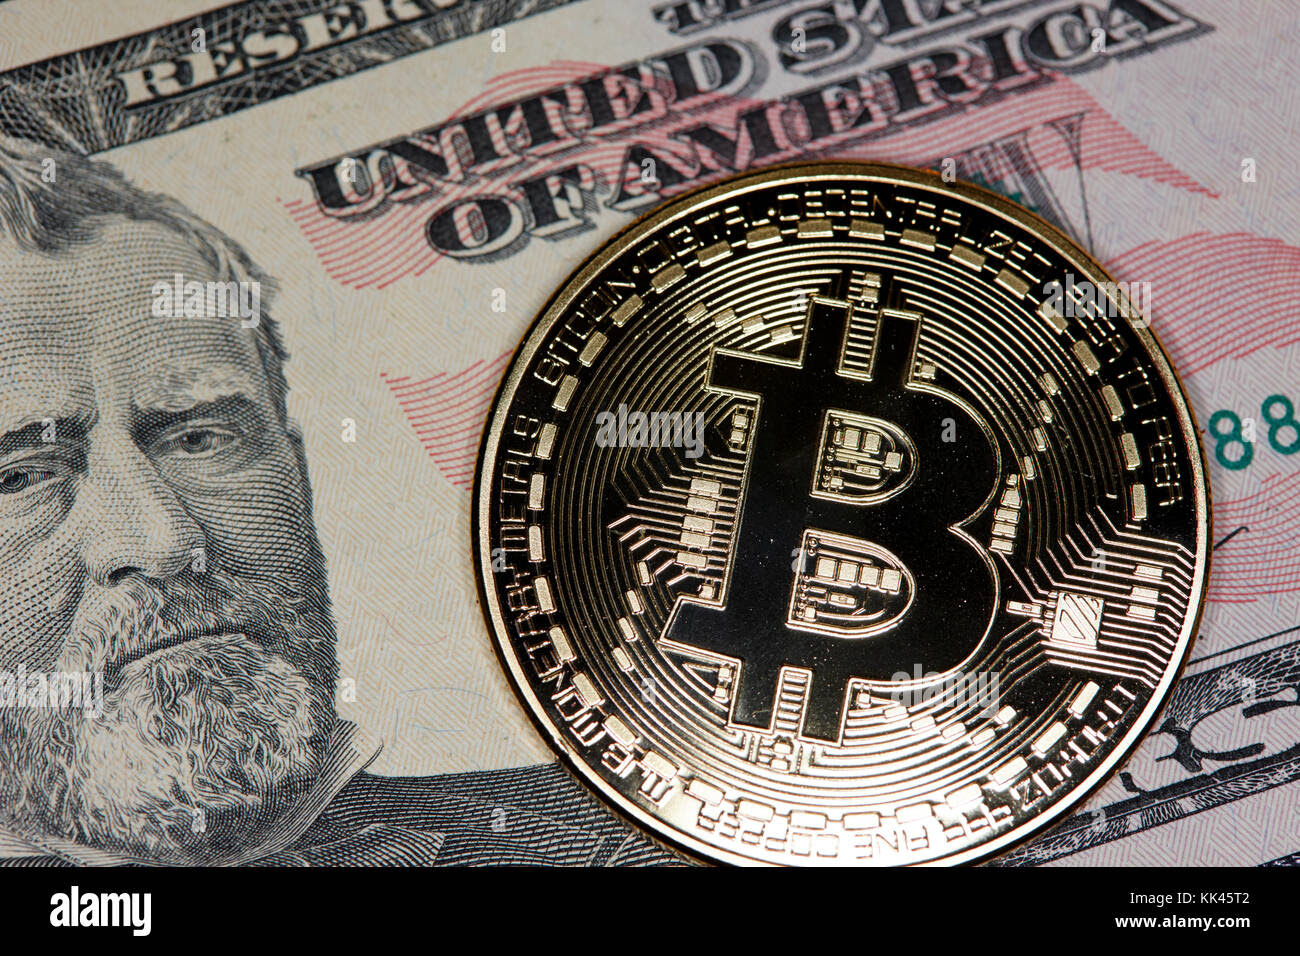 minimum to open bitcoin account